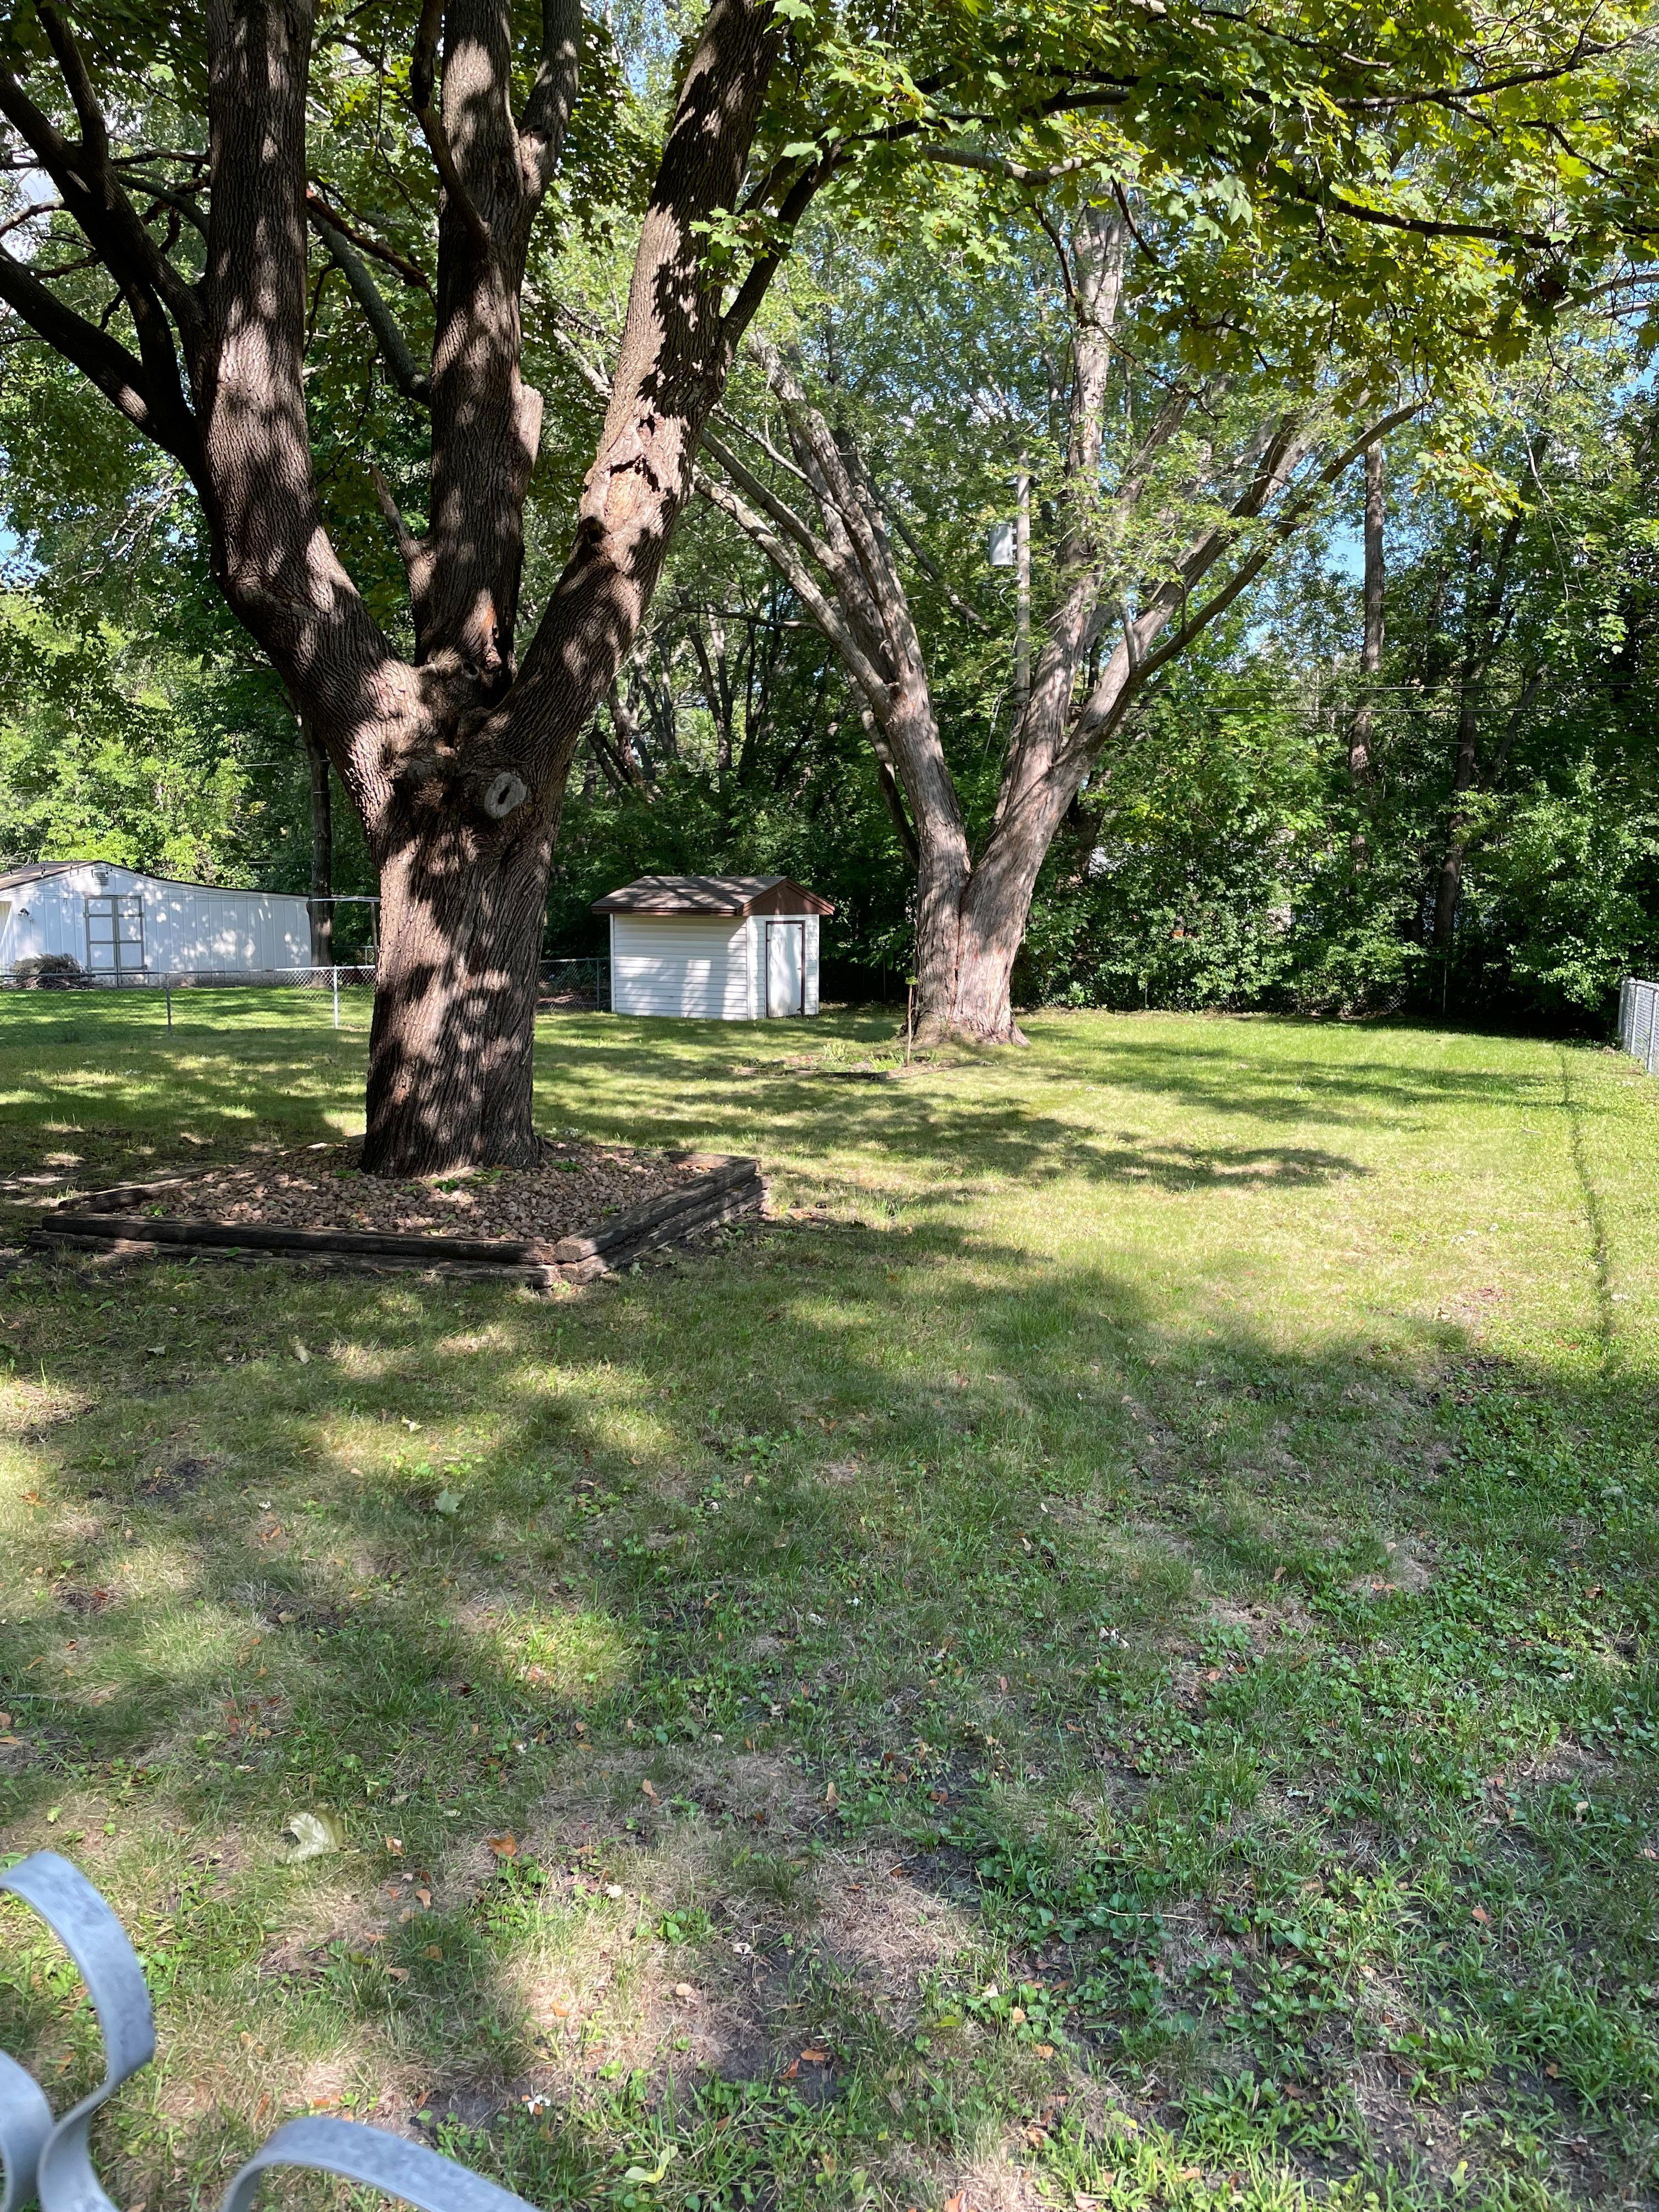 4096 Kentucky Ave N (Image - 2)